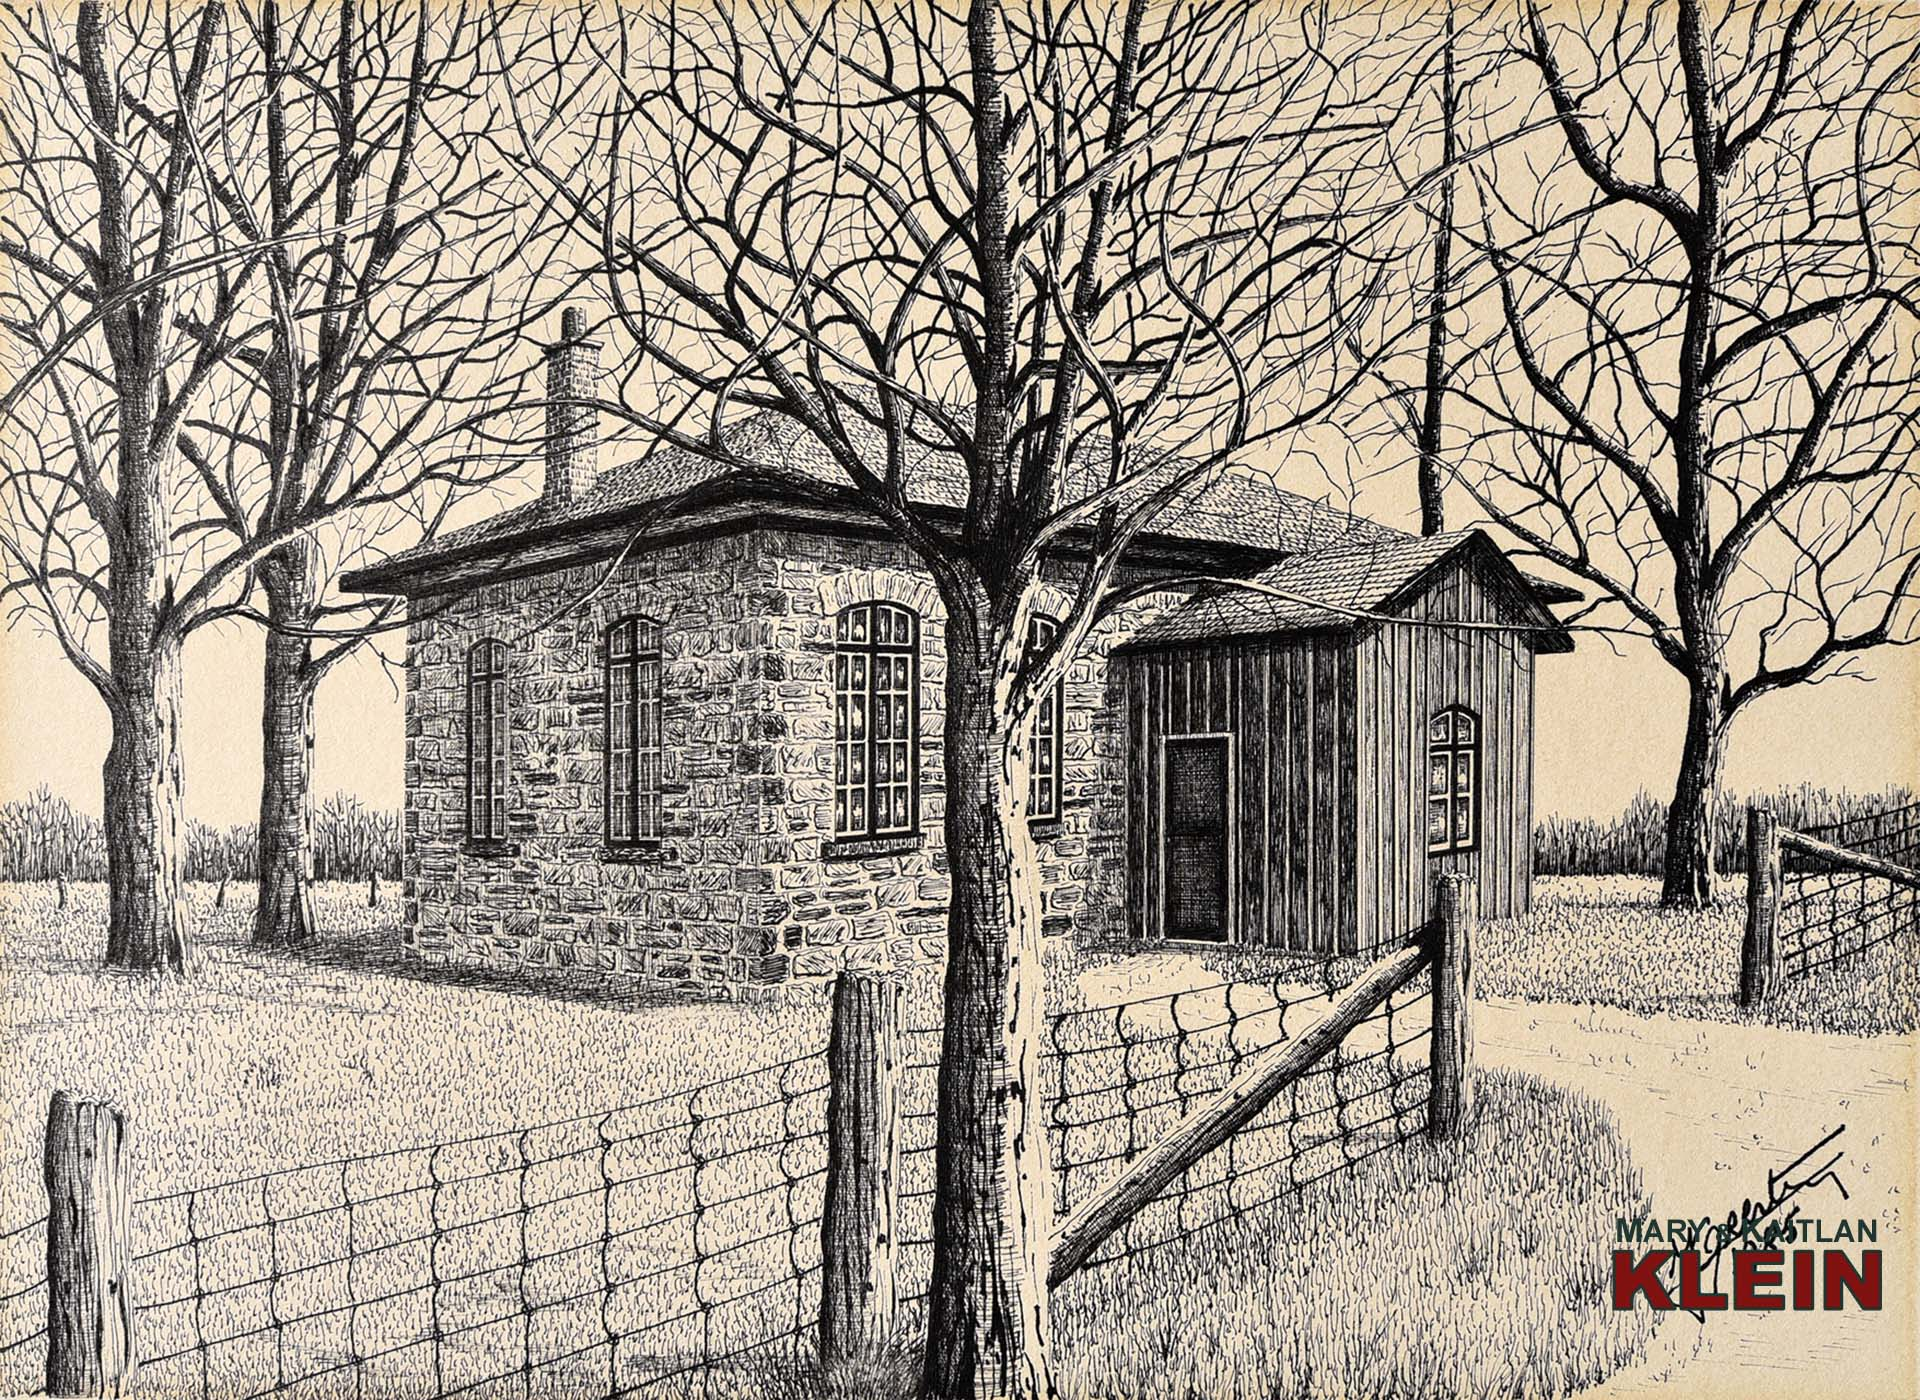 caledon rosehill schoolhouse